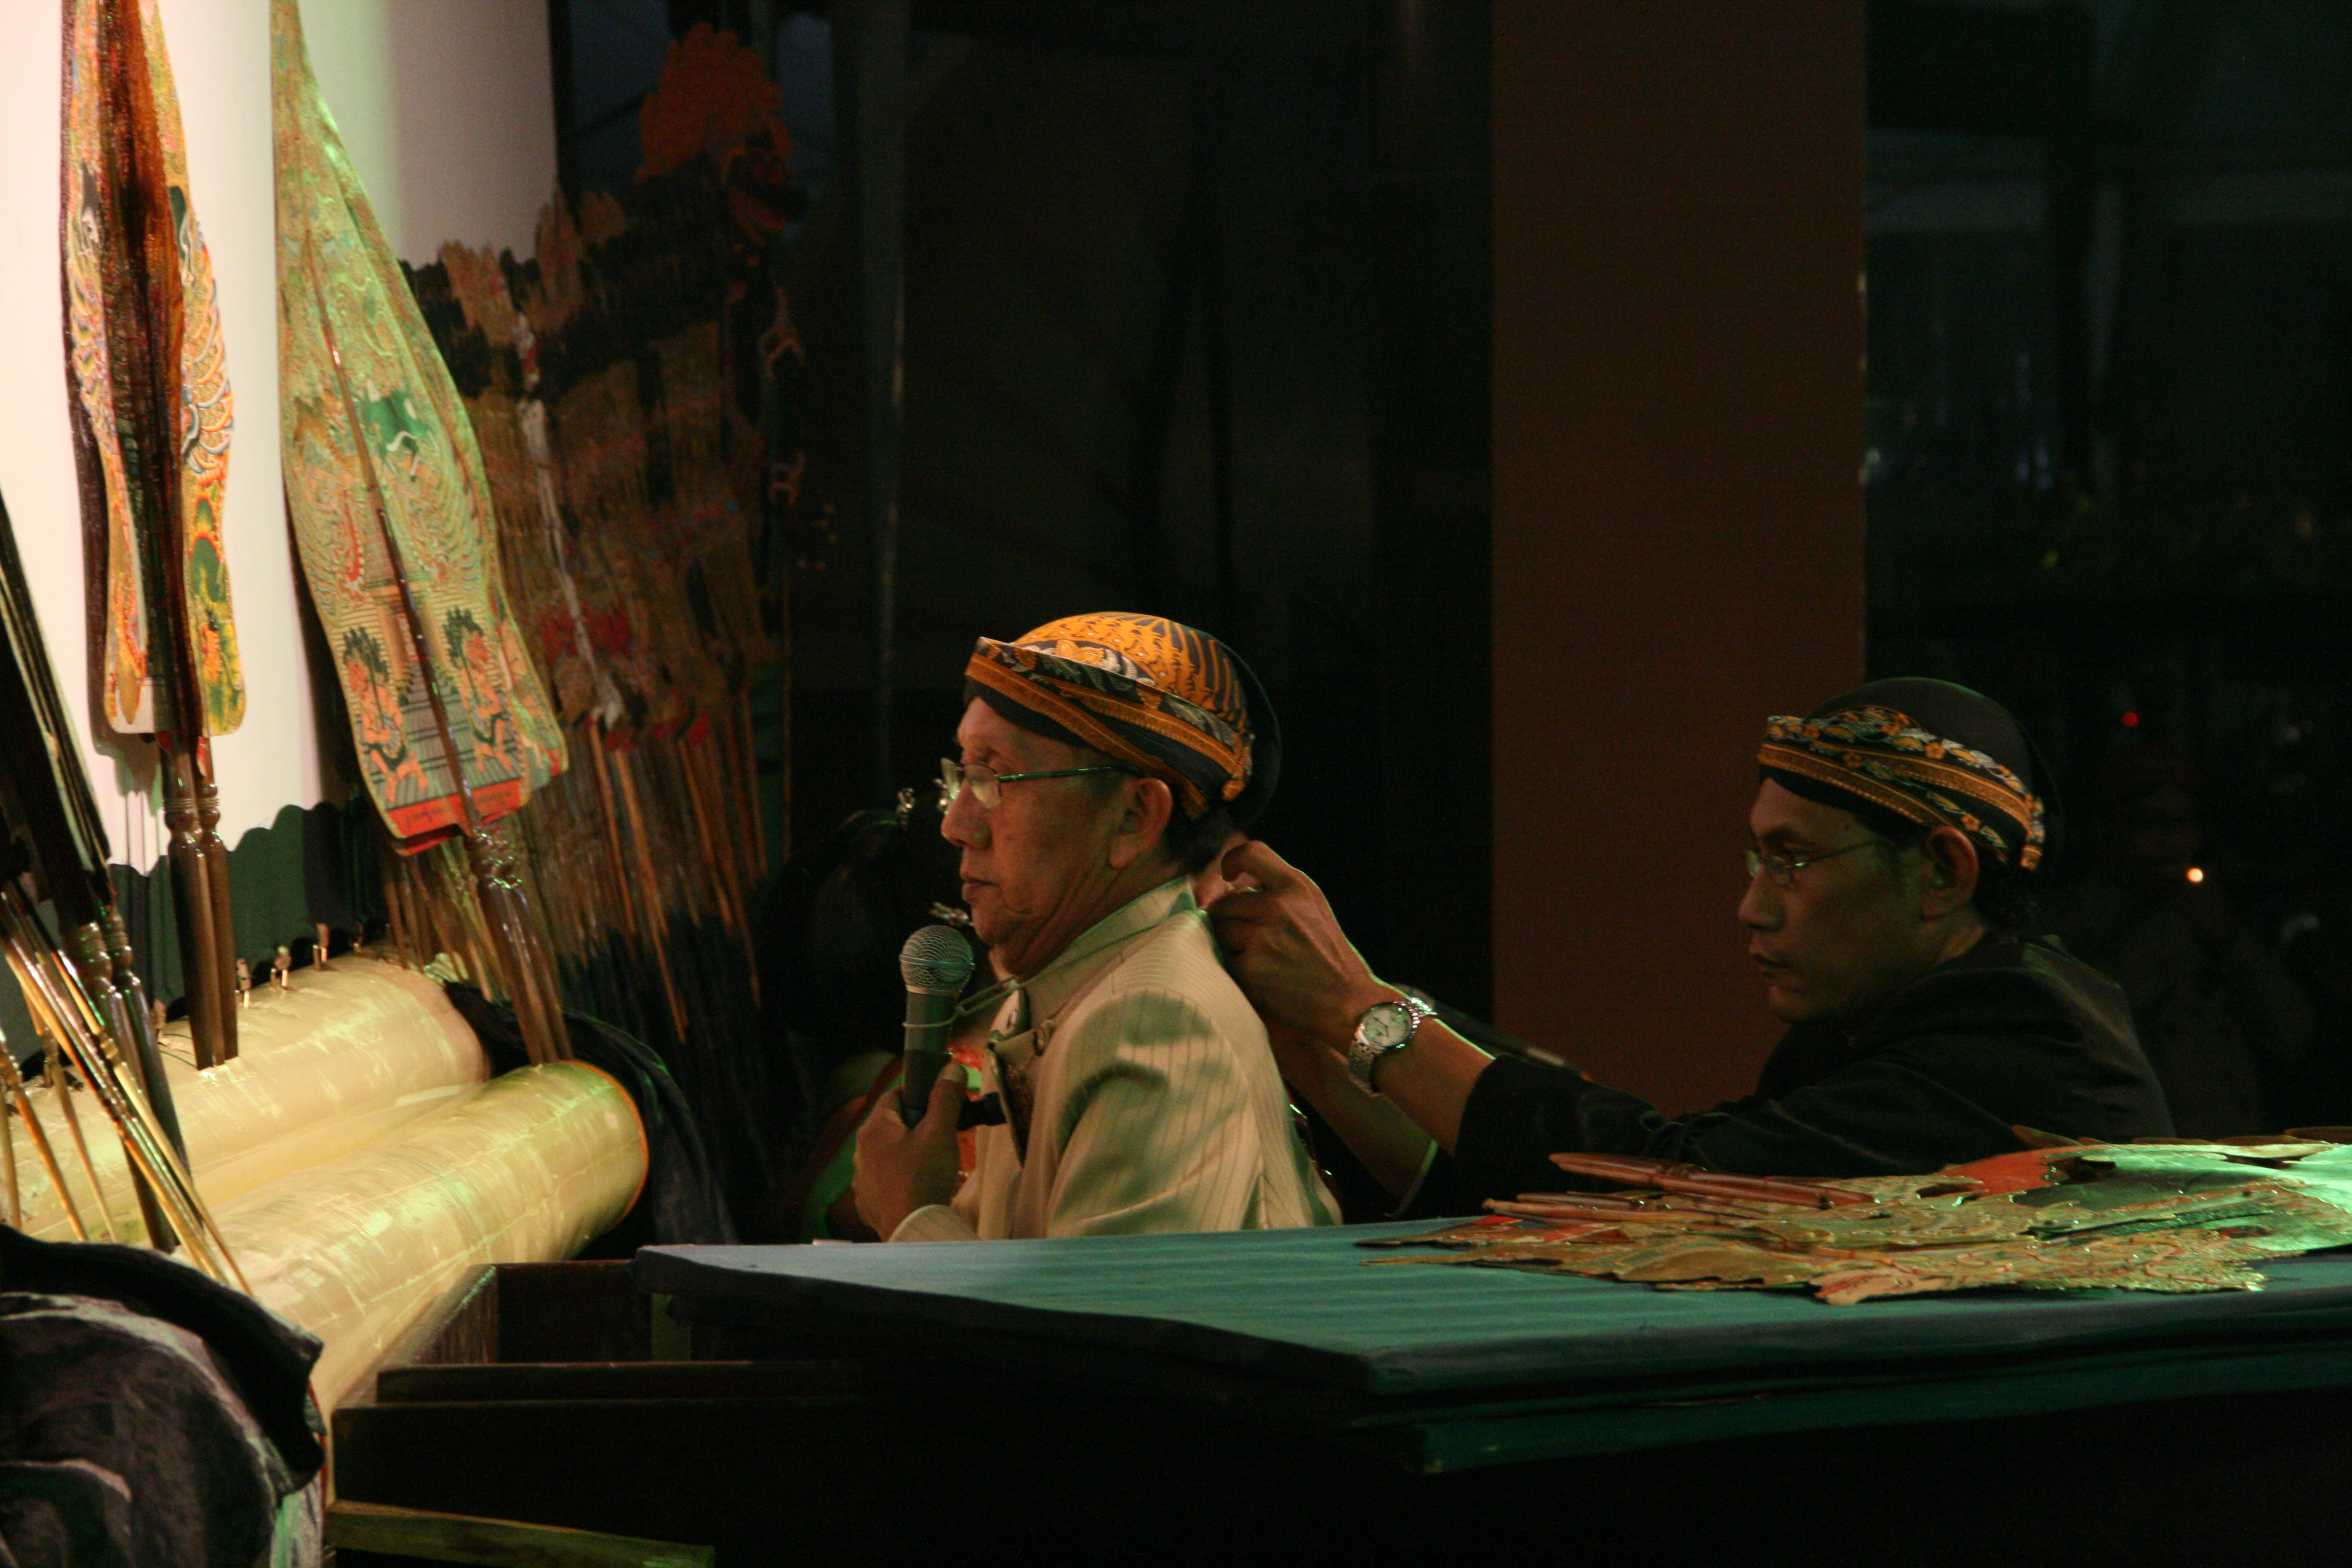 <em>Ki</em> Manteb Soedarsono (1948- ) de Karanganyar, Java central, maître marionnettiste indonésien (<em>dalang</em>) du <em>wayang <em>kulit</em> purwa</em> Surakarta.